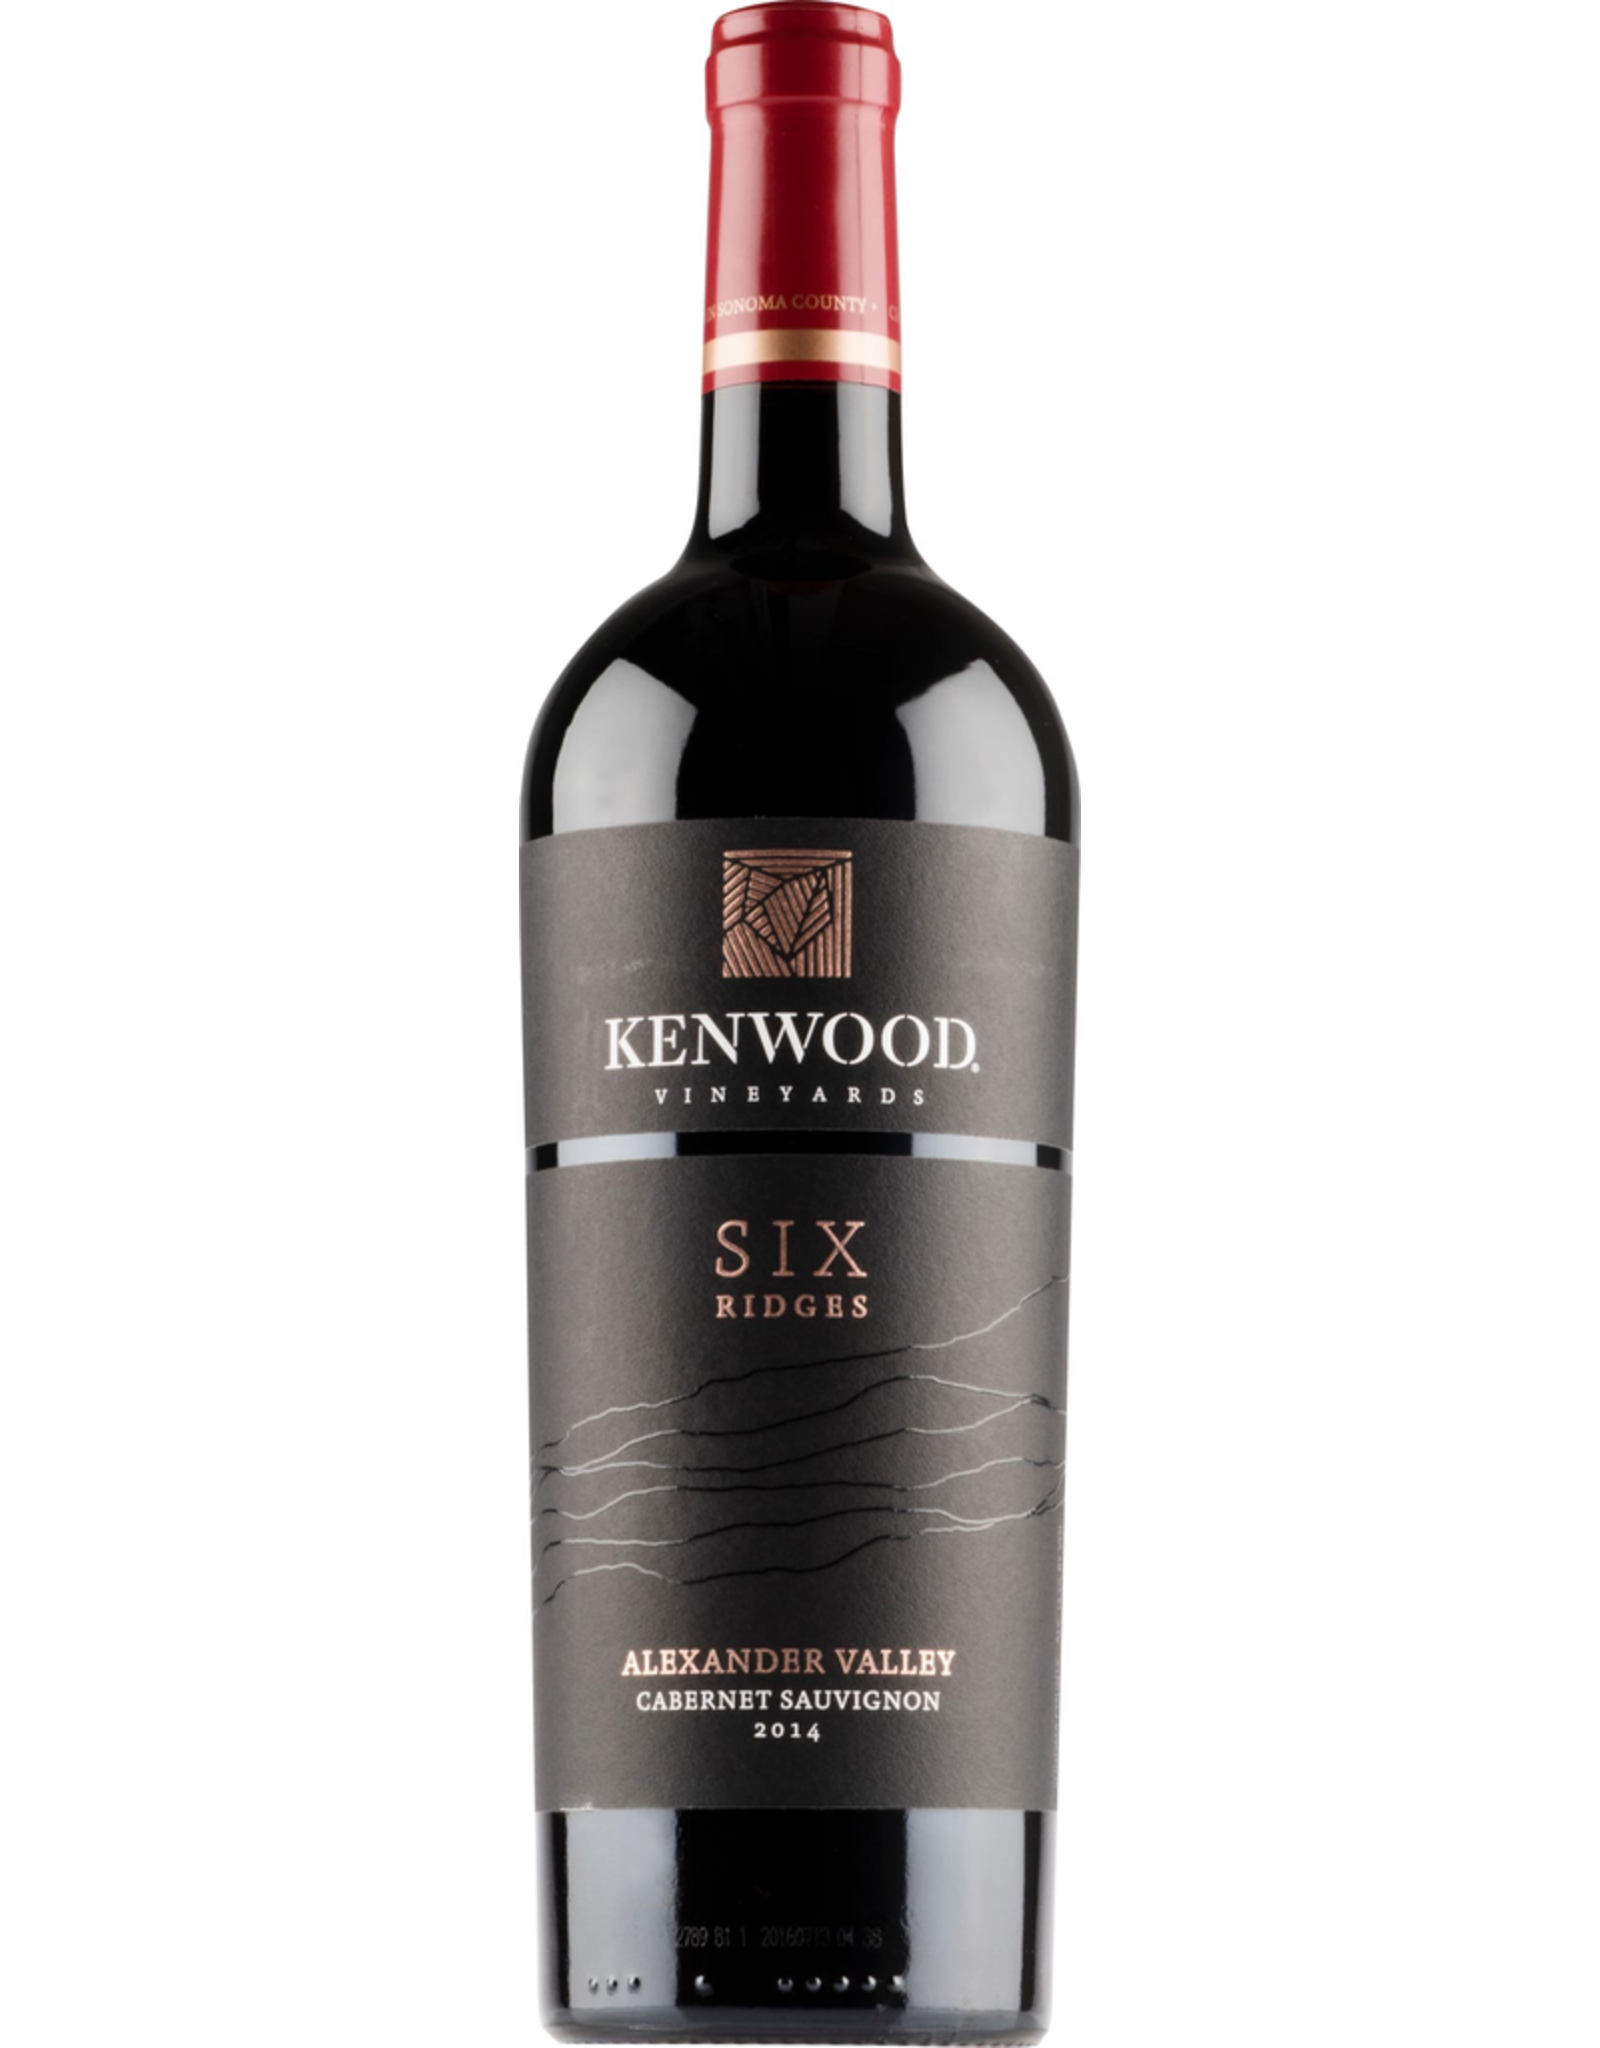 White Wine 2017, Kenwood Six Ridges, Cabernet Sauvignon, Alexander Valley, Sonoma, California, 14.5% Alc, CTnr, TW92